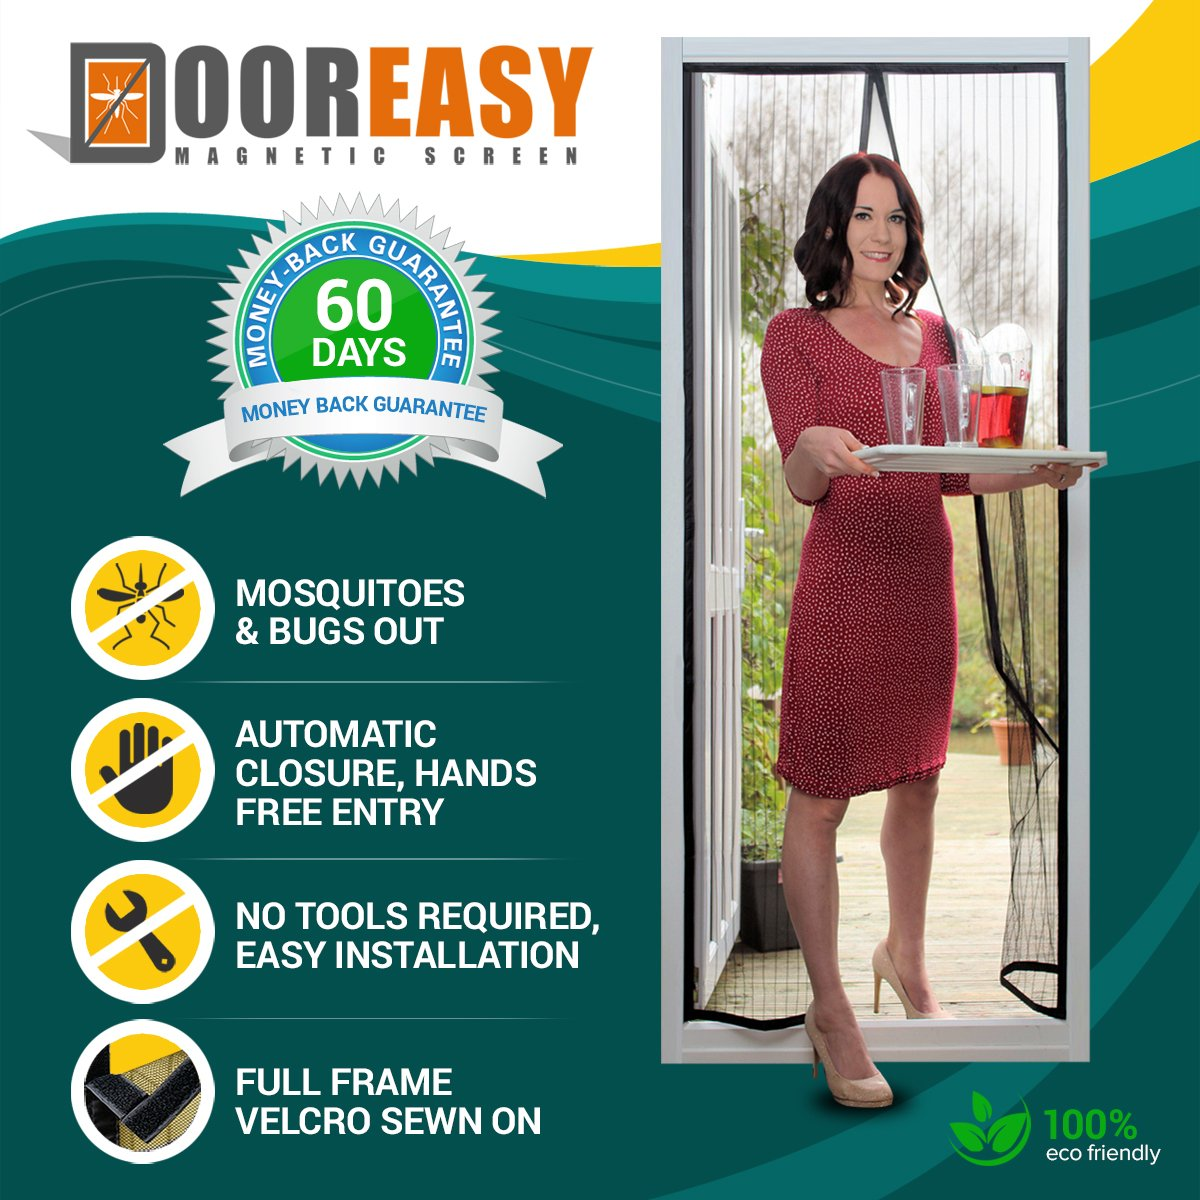 Dooreasy Magnetic Screen Door, Micro Mesh, Heavy Magnets, Loop Fully Sewn Easy Install Door Screens With Magnets, Bug-Free Best Screen(Fits Doors Up To 46'' x 79'')